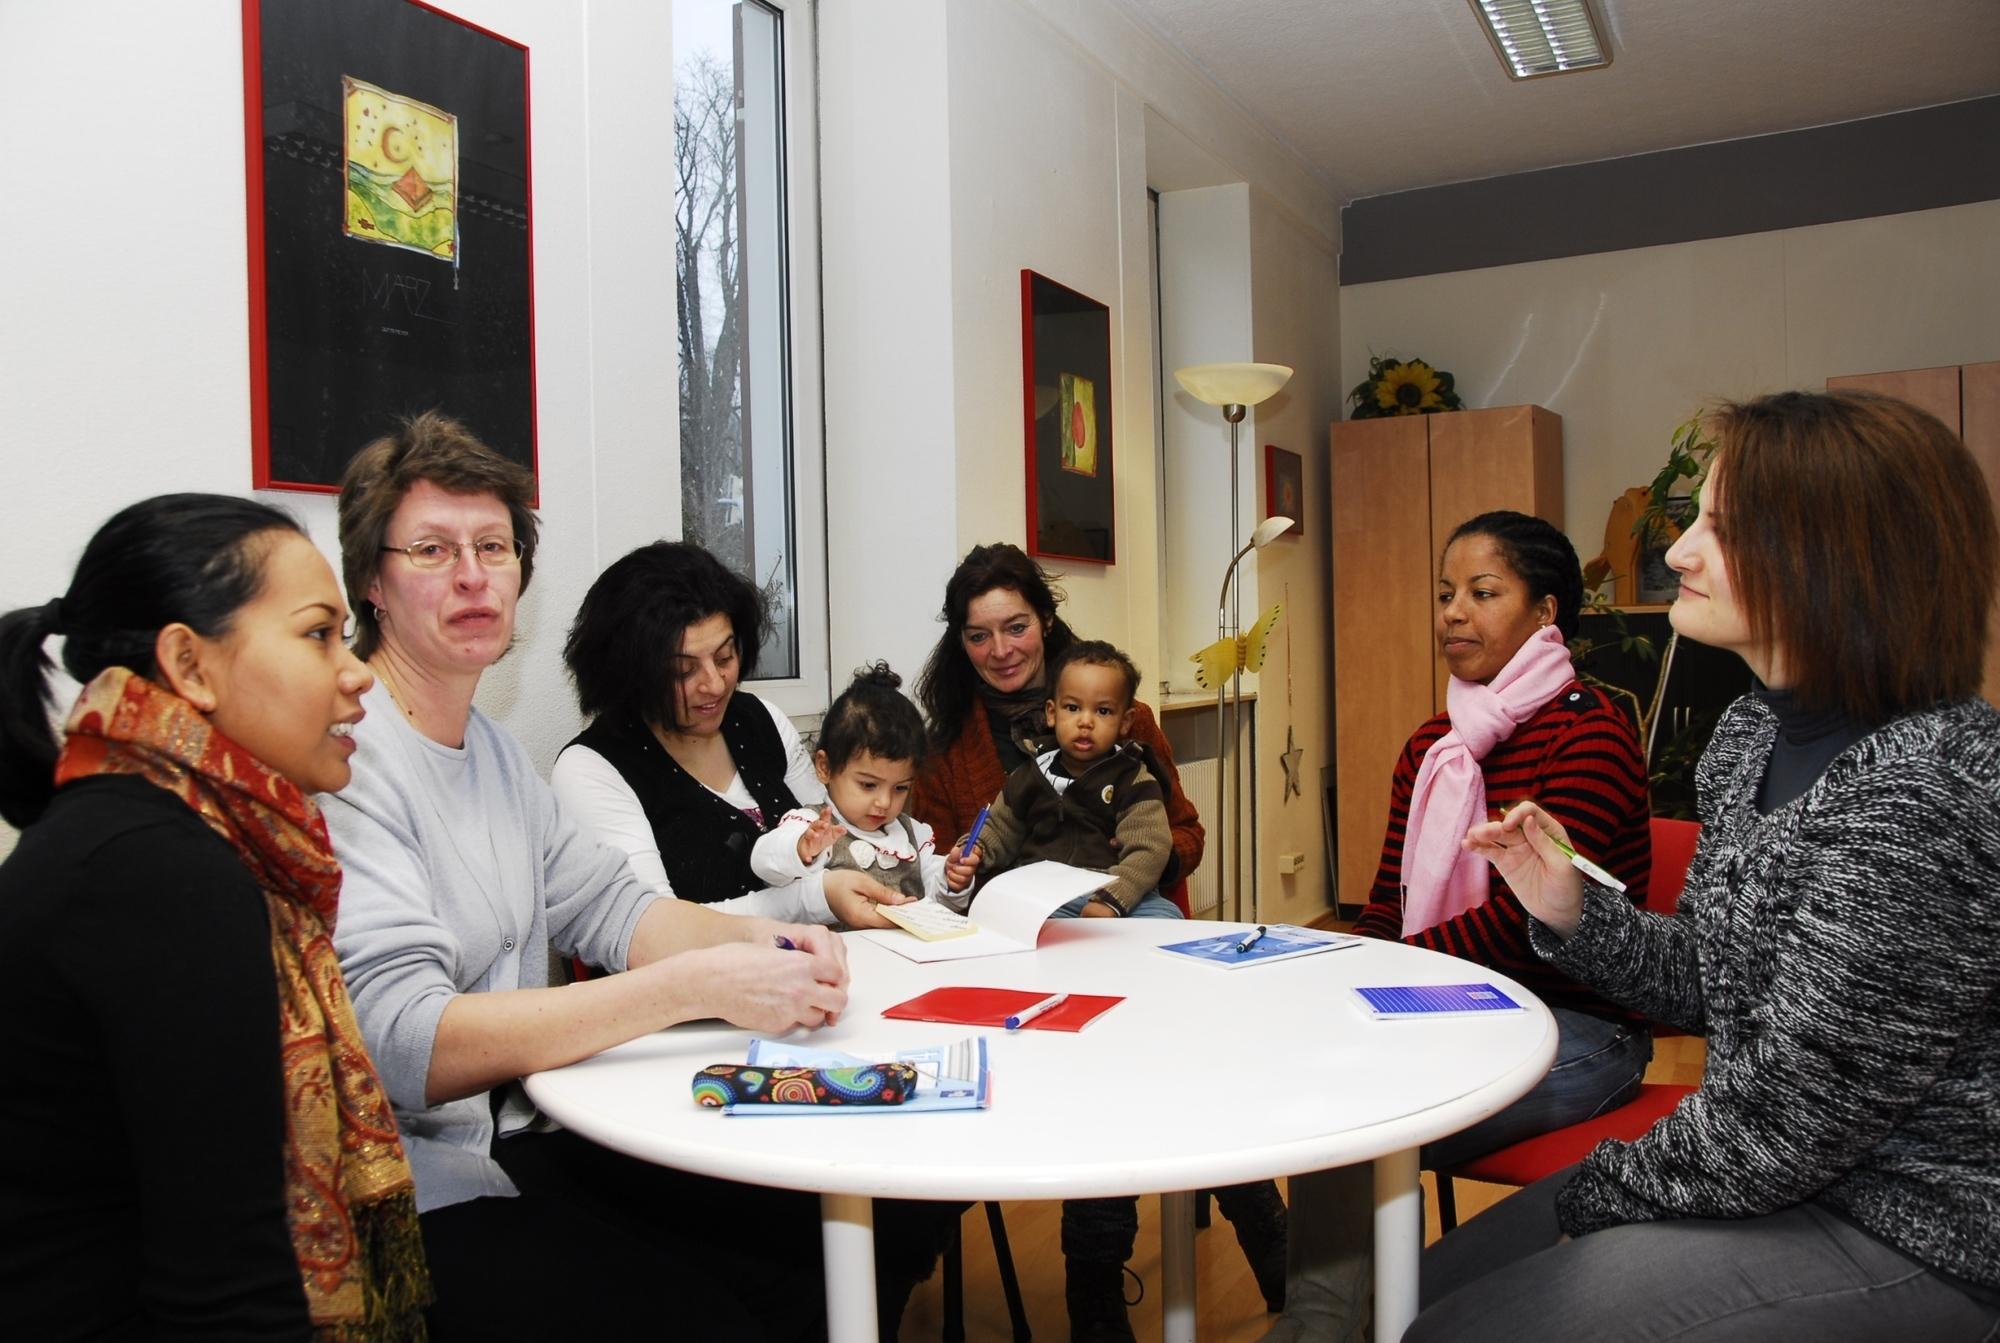 Verein des Monats März: DJK-SSG Bensheim